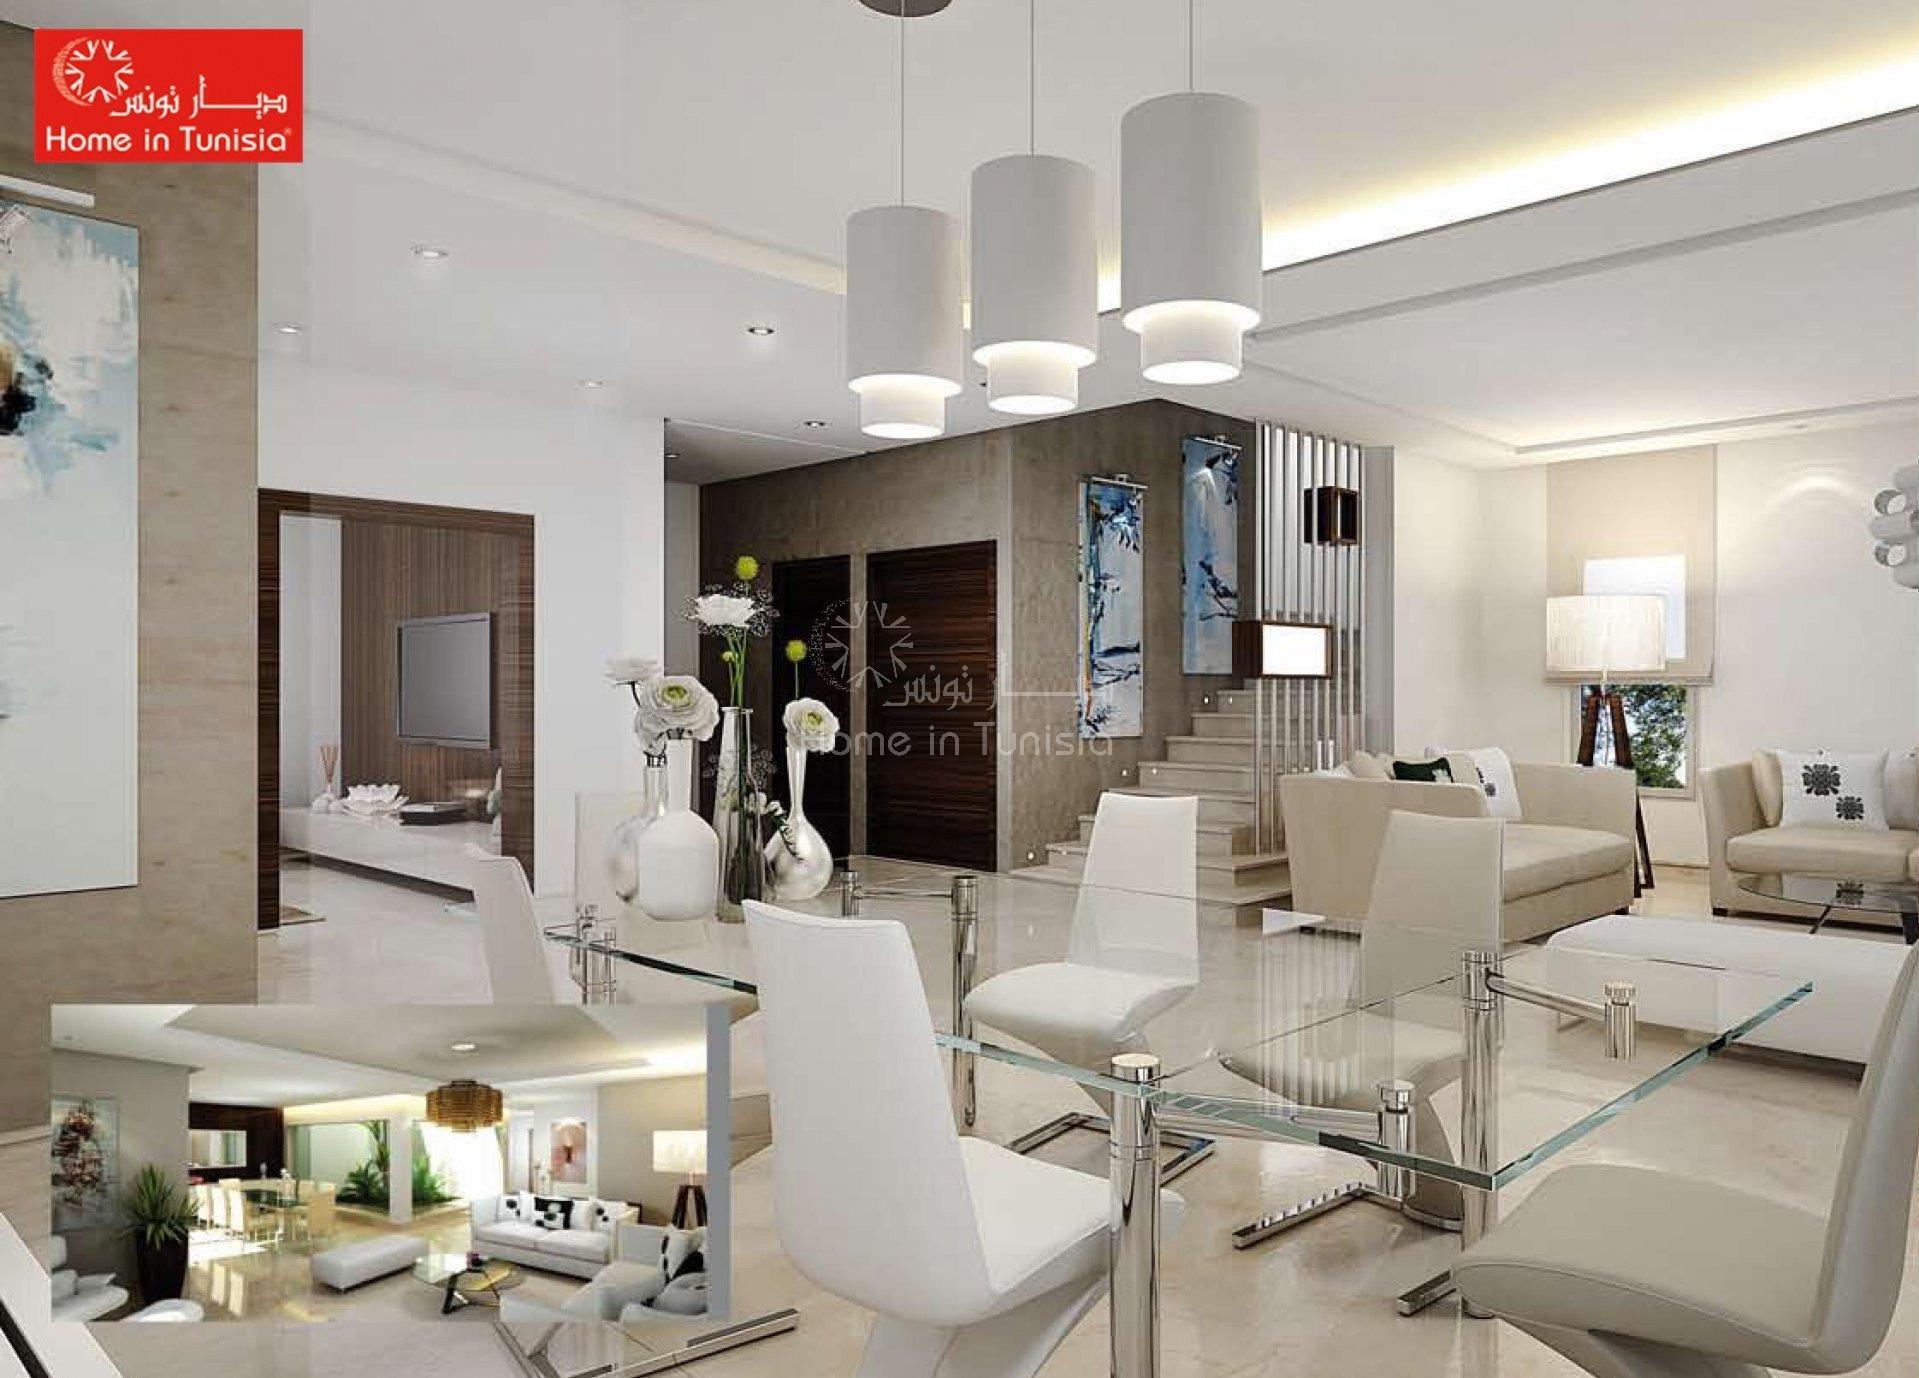 Villa golf jumelée neuve de 327.35 m2 avec 4 chambres terrasse jardin piscine